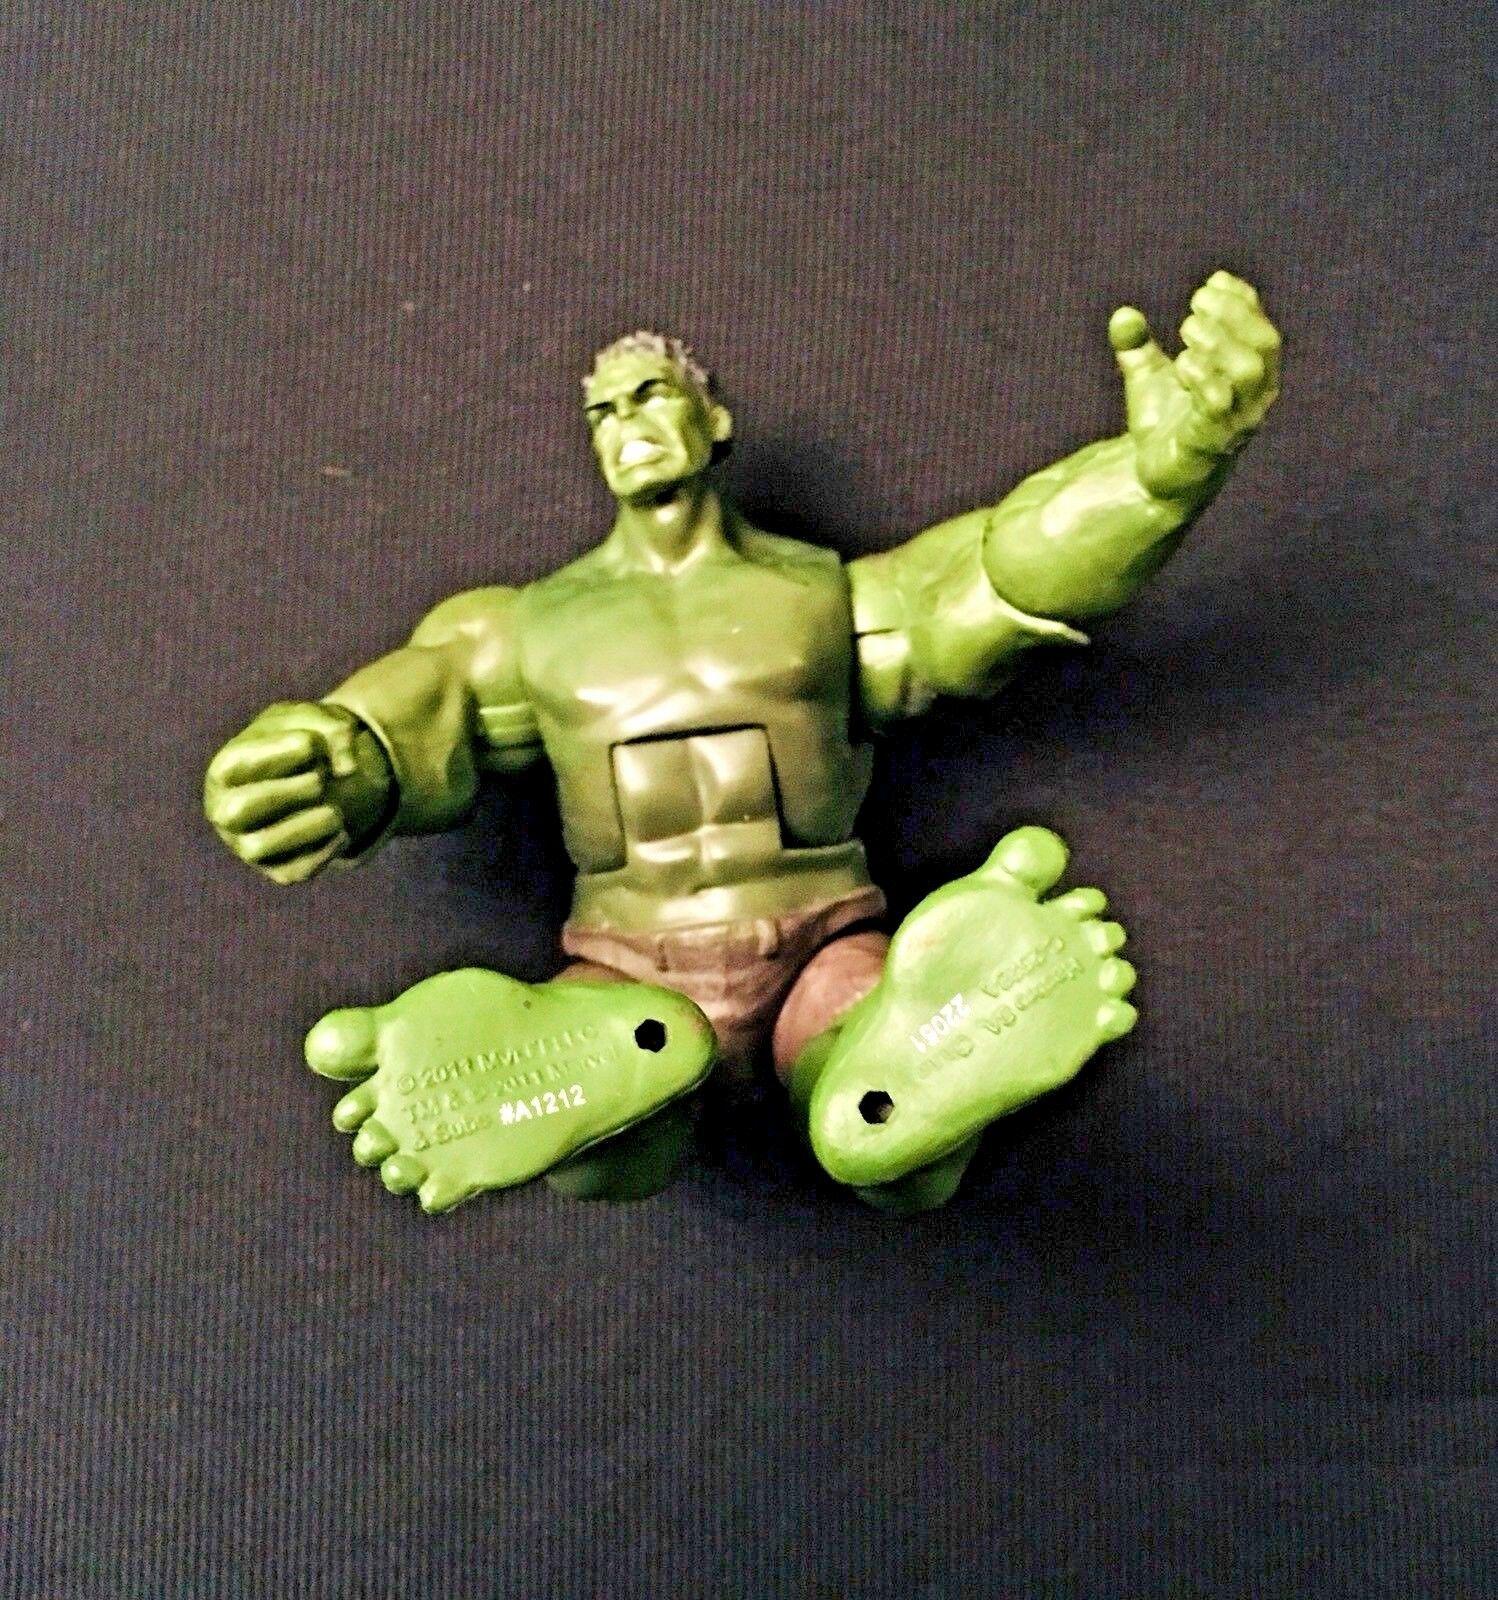 Incredible Hulk Loose Action Figure Hasbro 2011 Marvel Toy